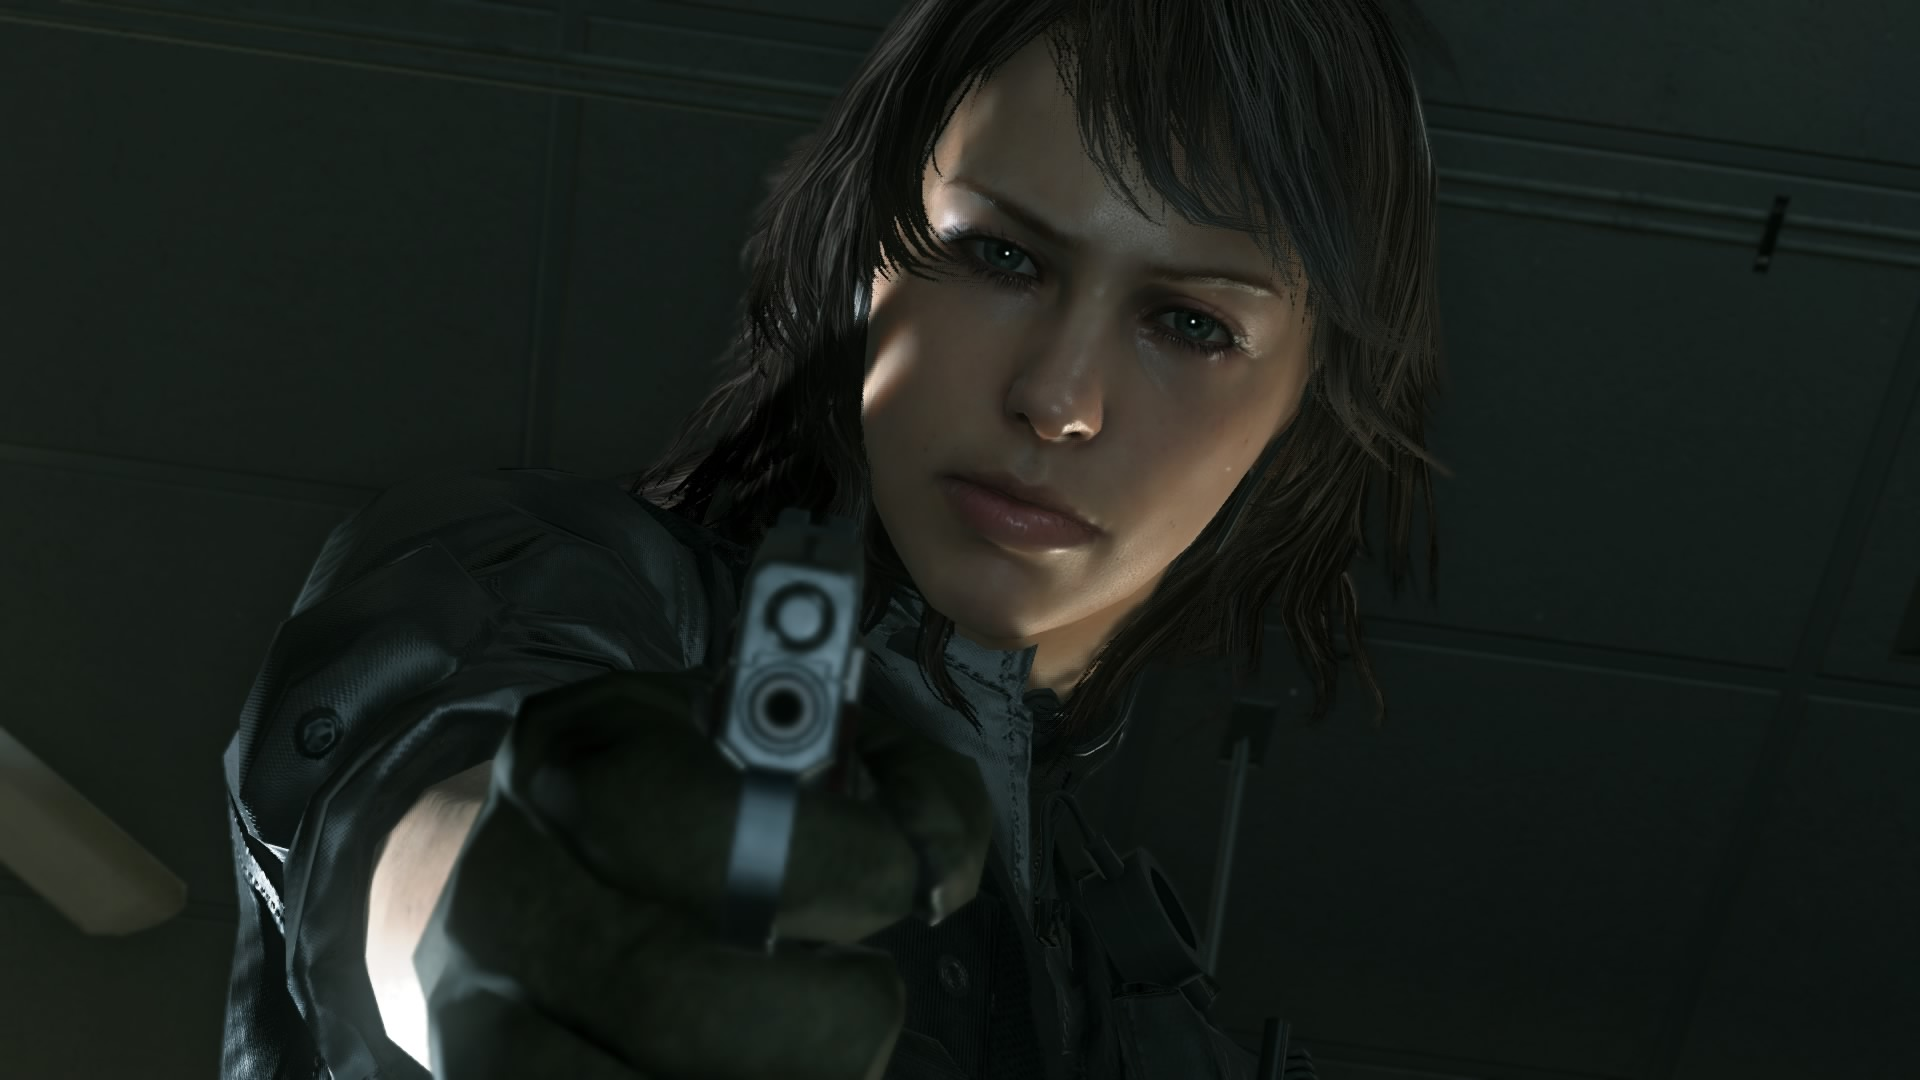 Quiet - Metal Gear Solid V The Phantom Pain